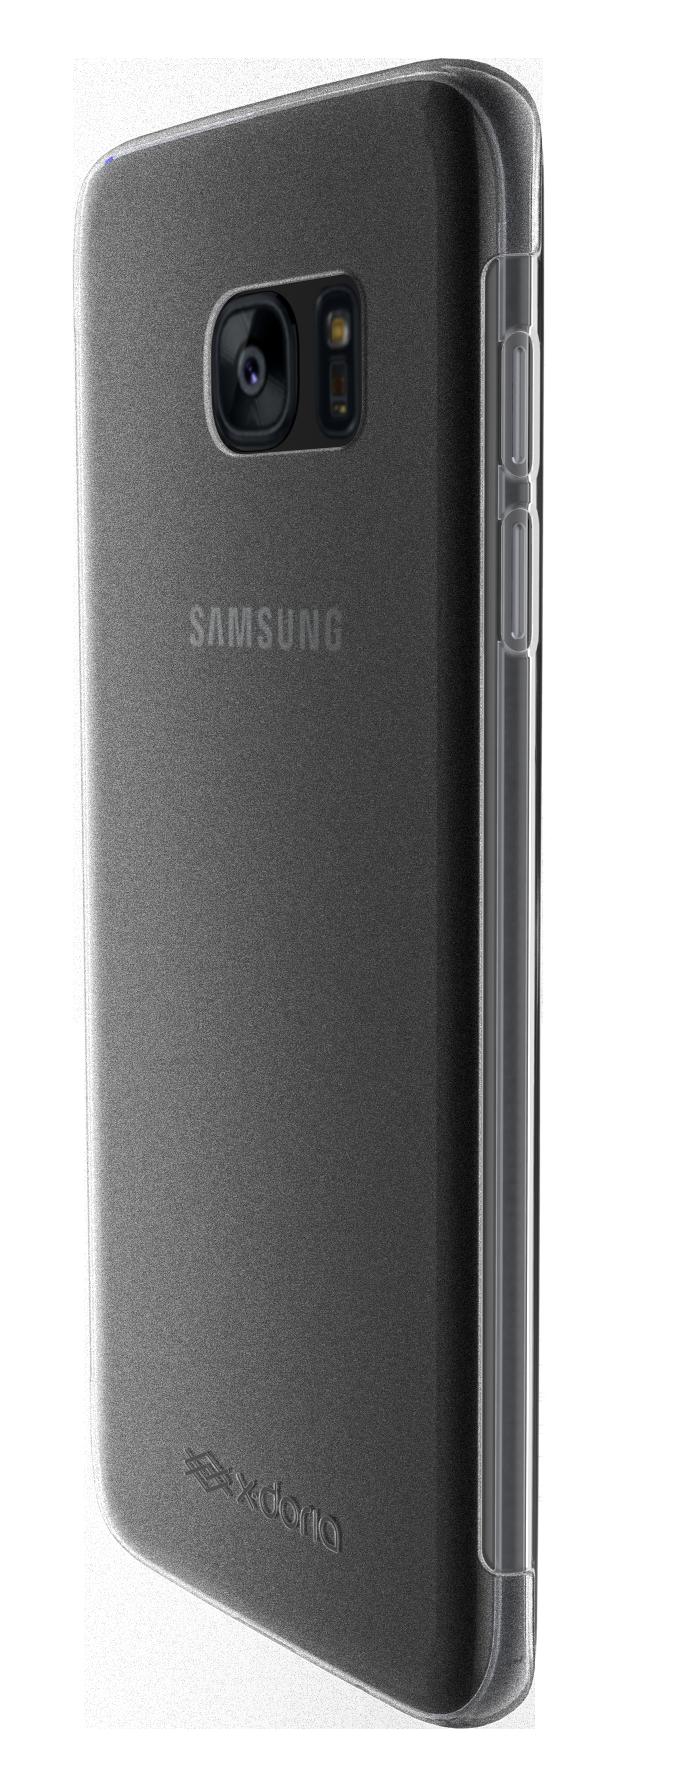 Coque XDORIA Defense 360 Samsung Galaxy S7 EDGE